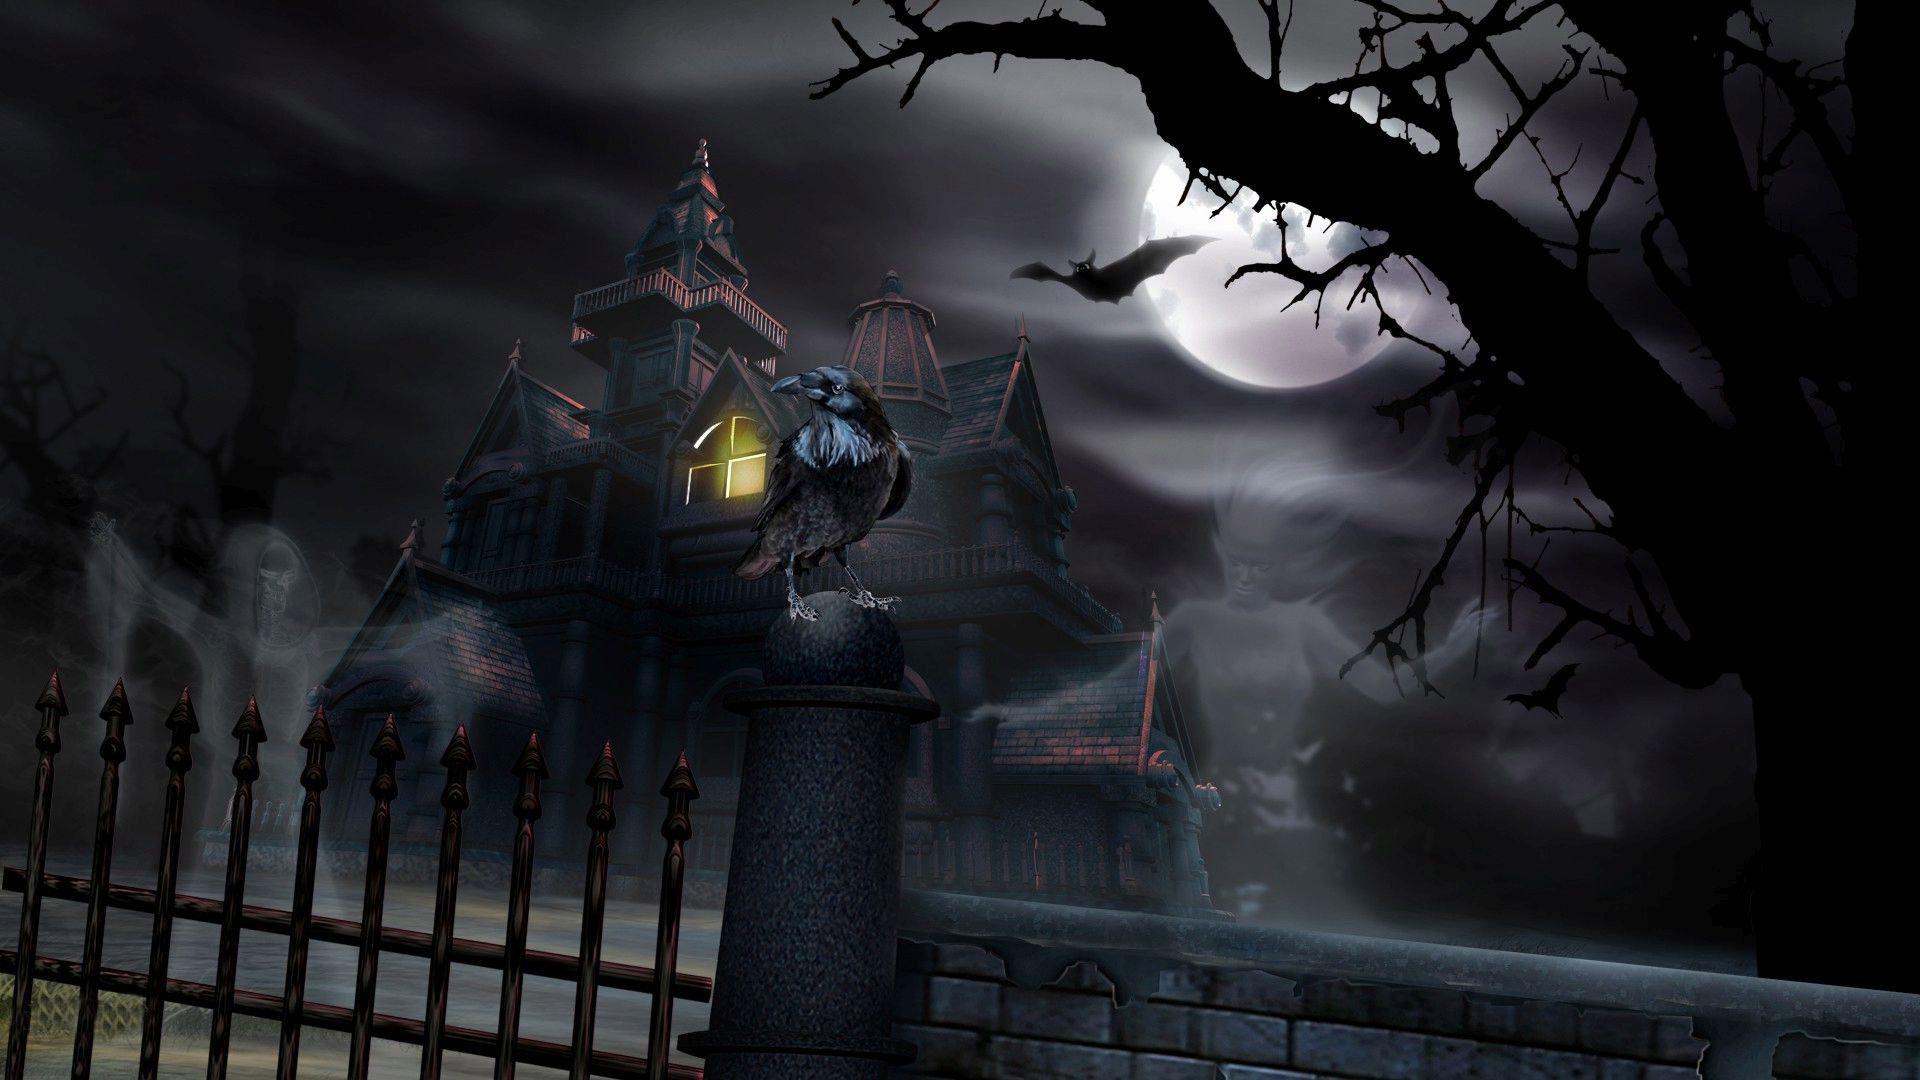 Best Wallpaper Halloween Haunted - 0b3eb51928737d88f8cdf074cac076ec  Photograph_573121.jpg